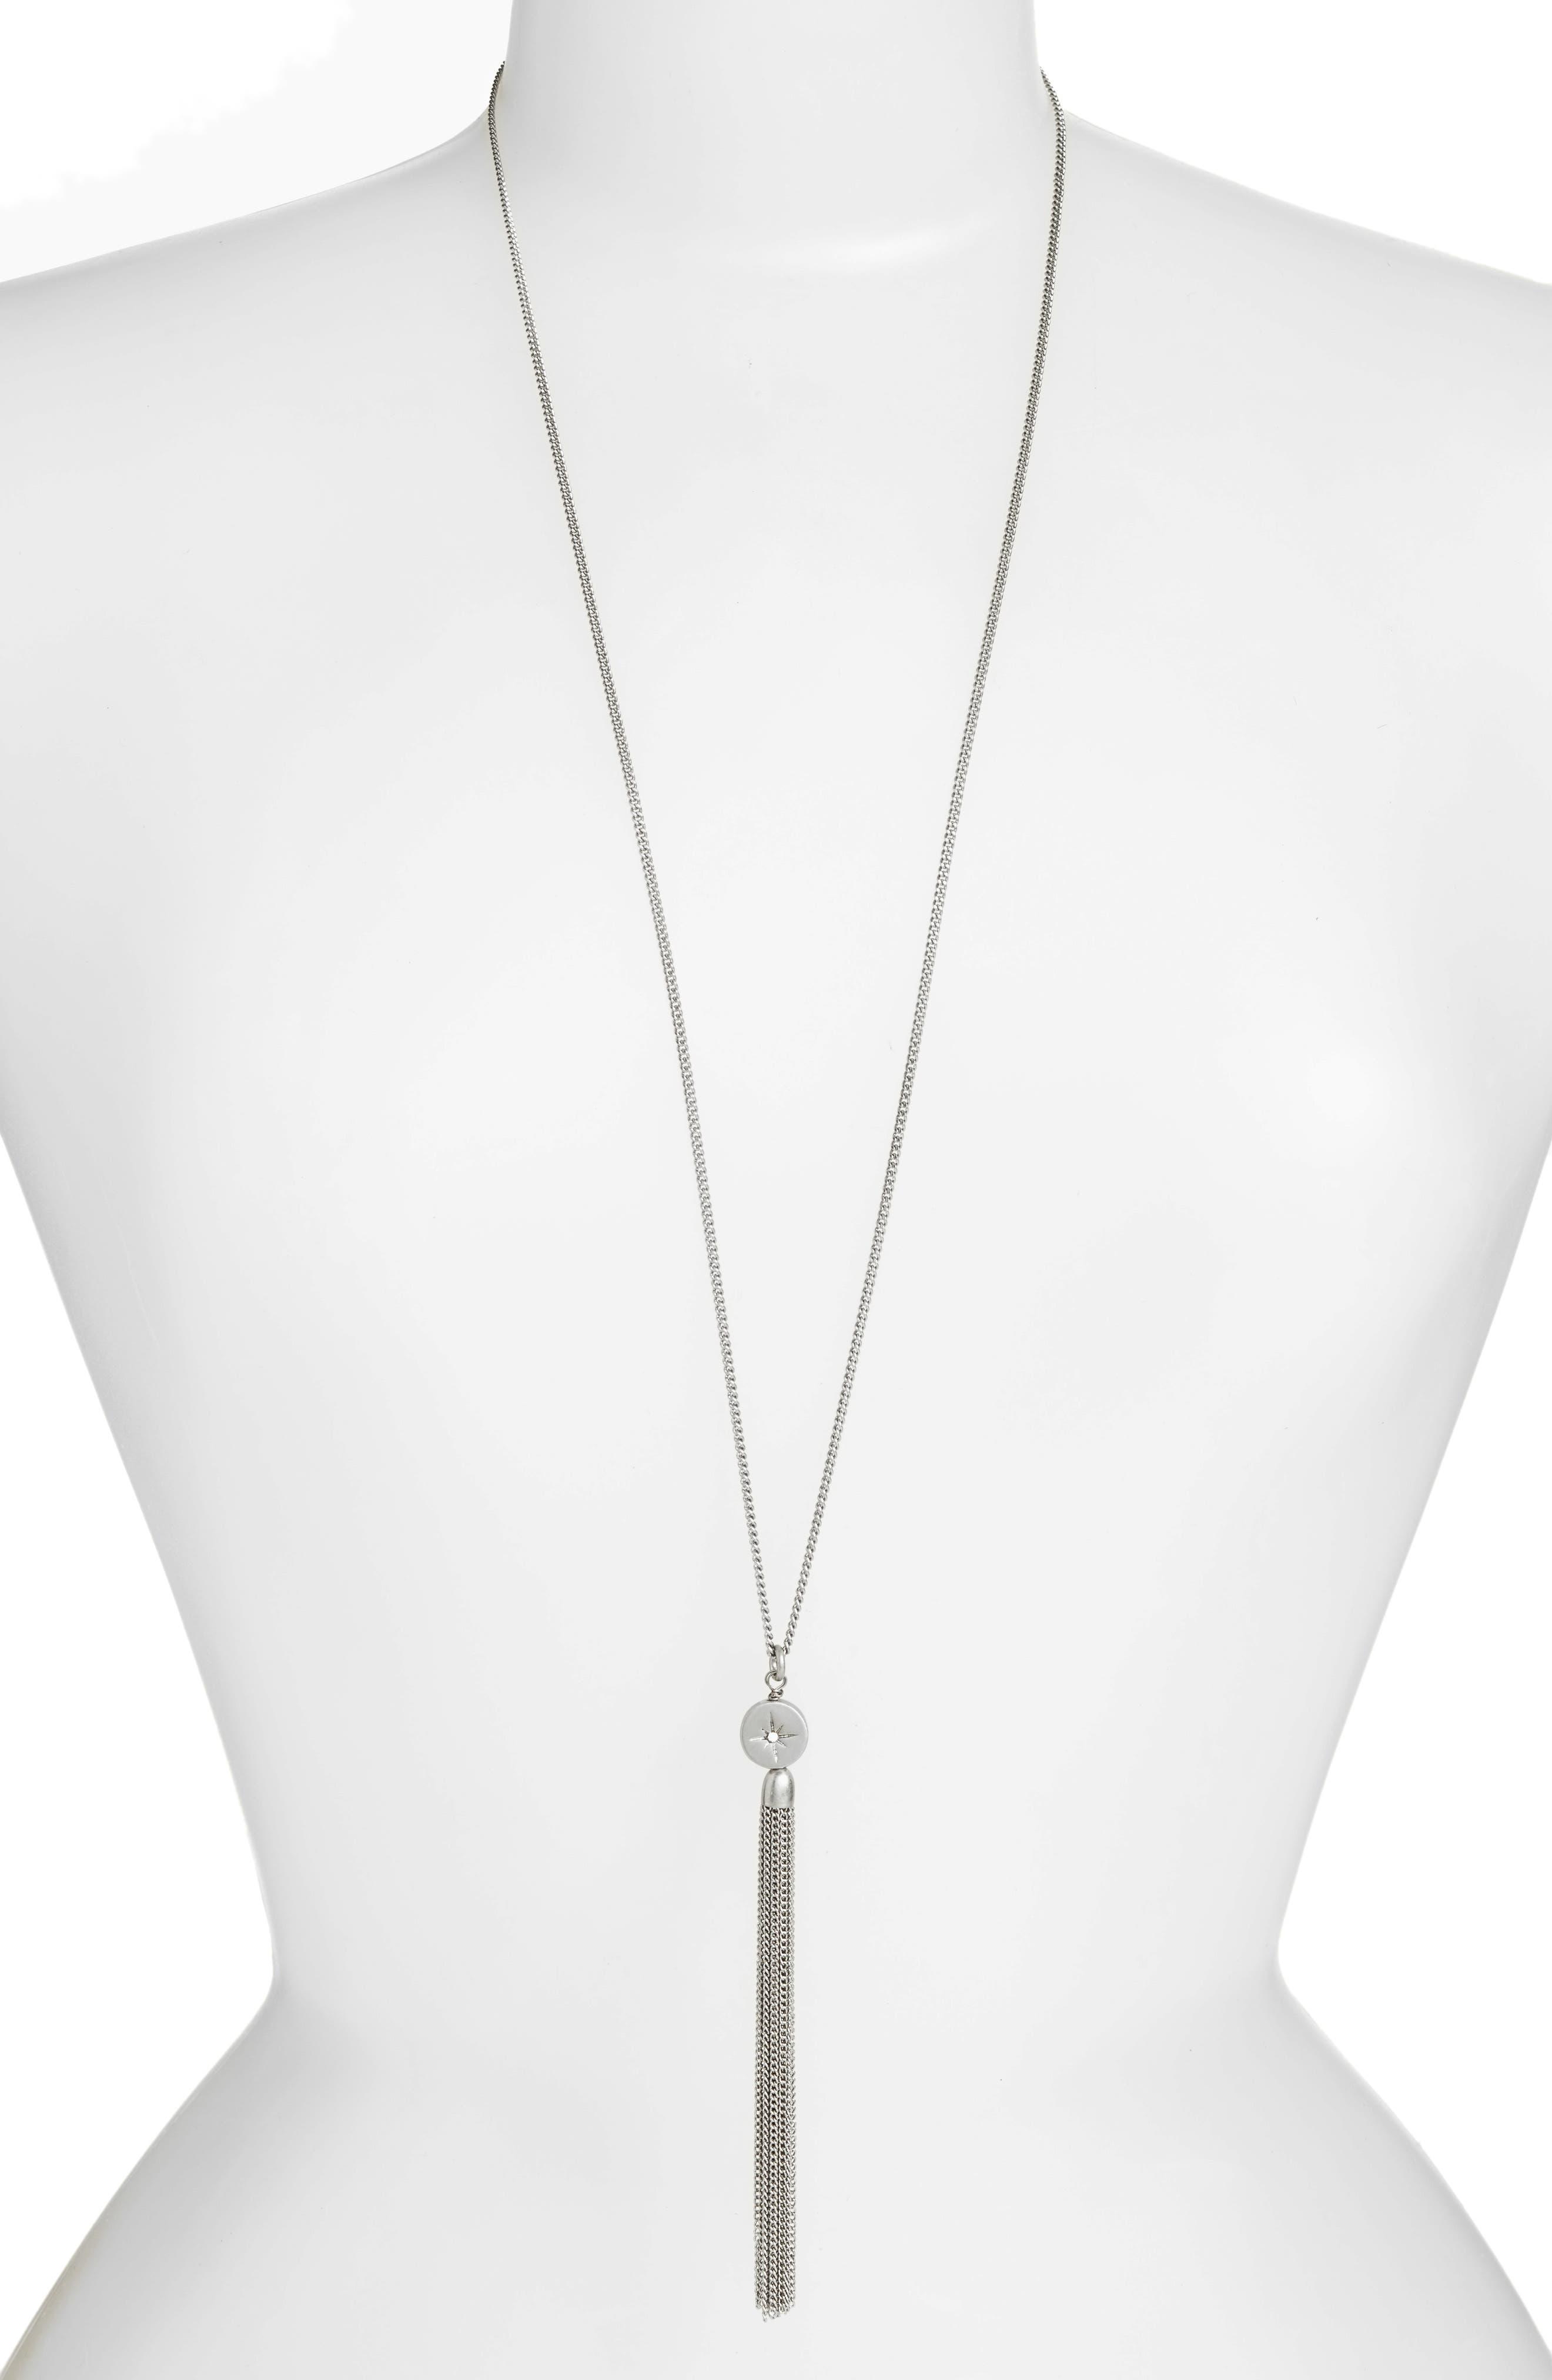 Star Disc Tassel Pendant Necklace,                             Main thumbnail 1, color,                             Clear- Rhodium